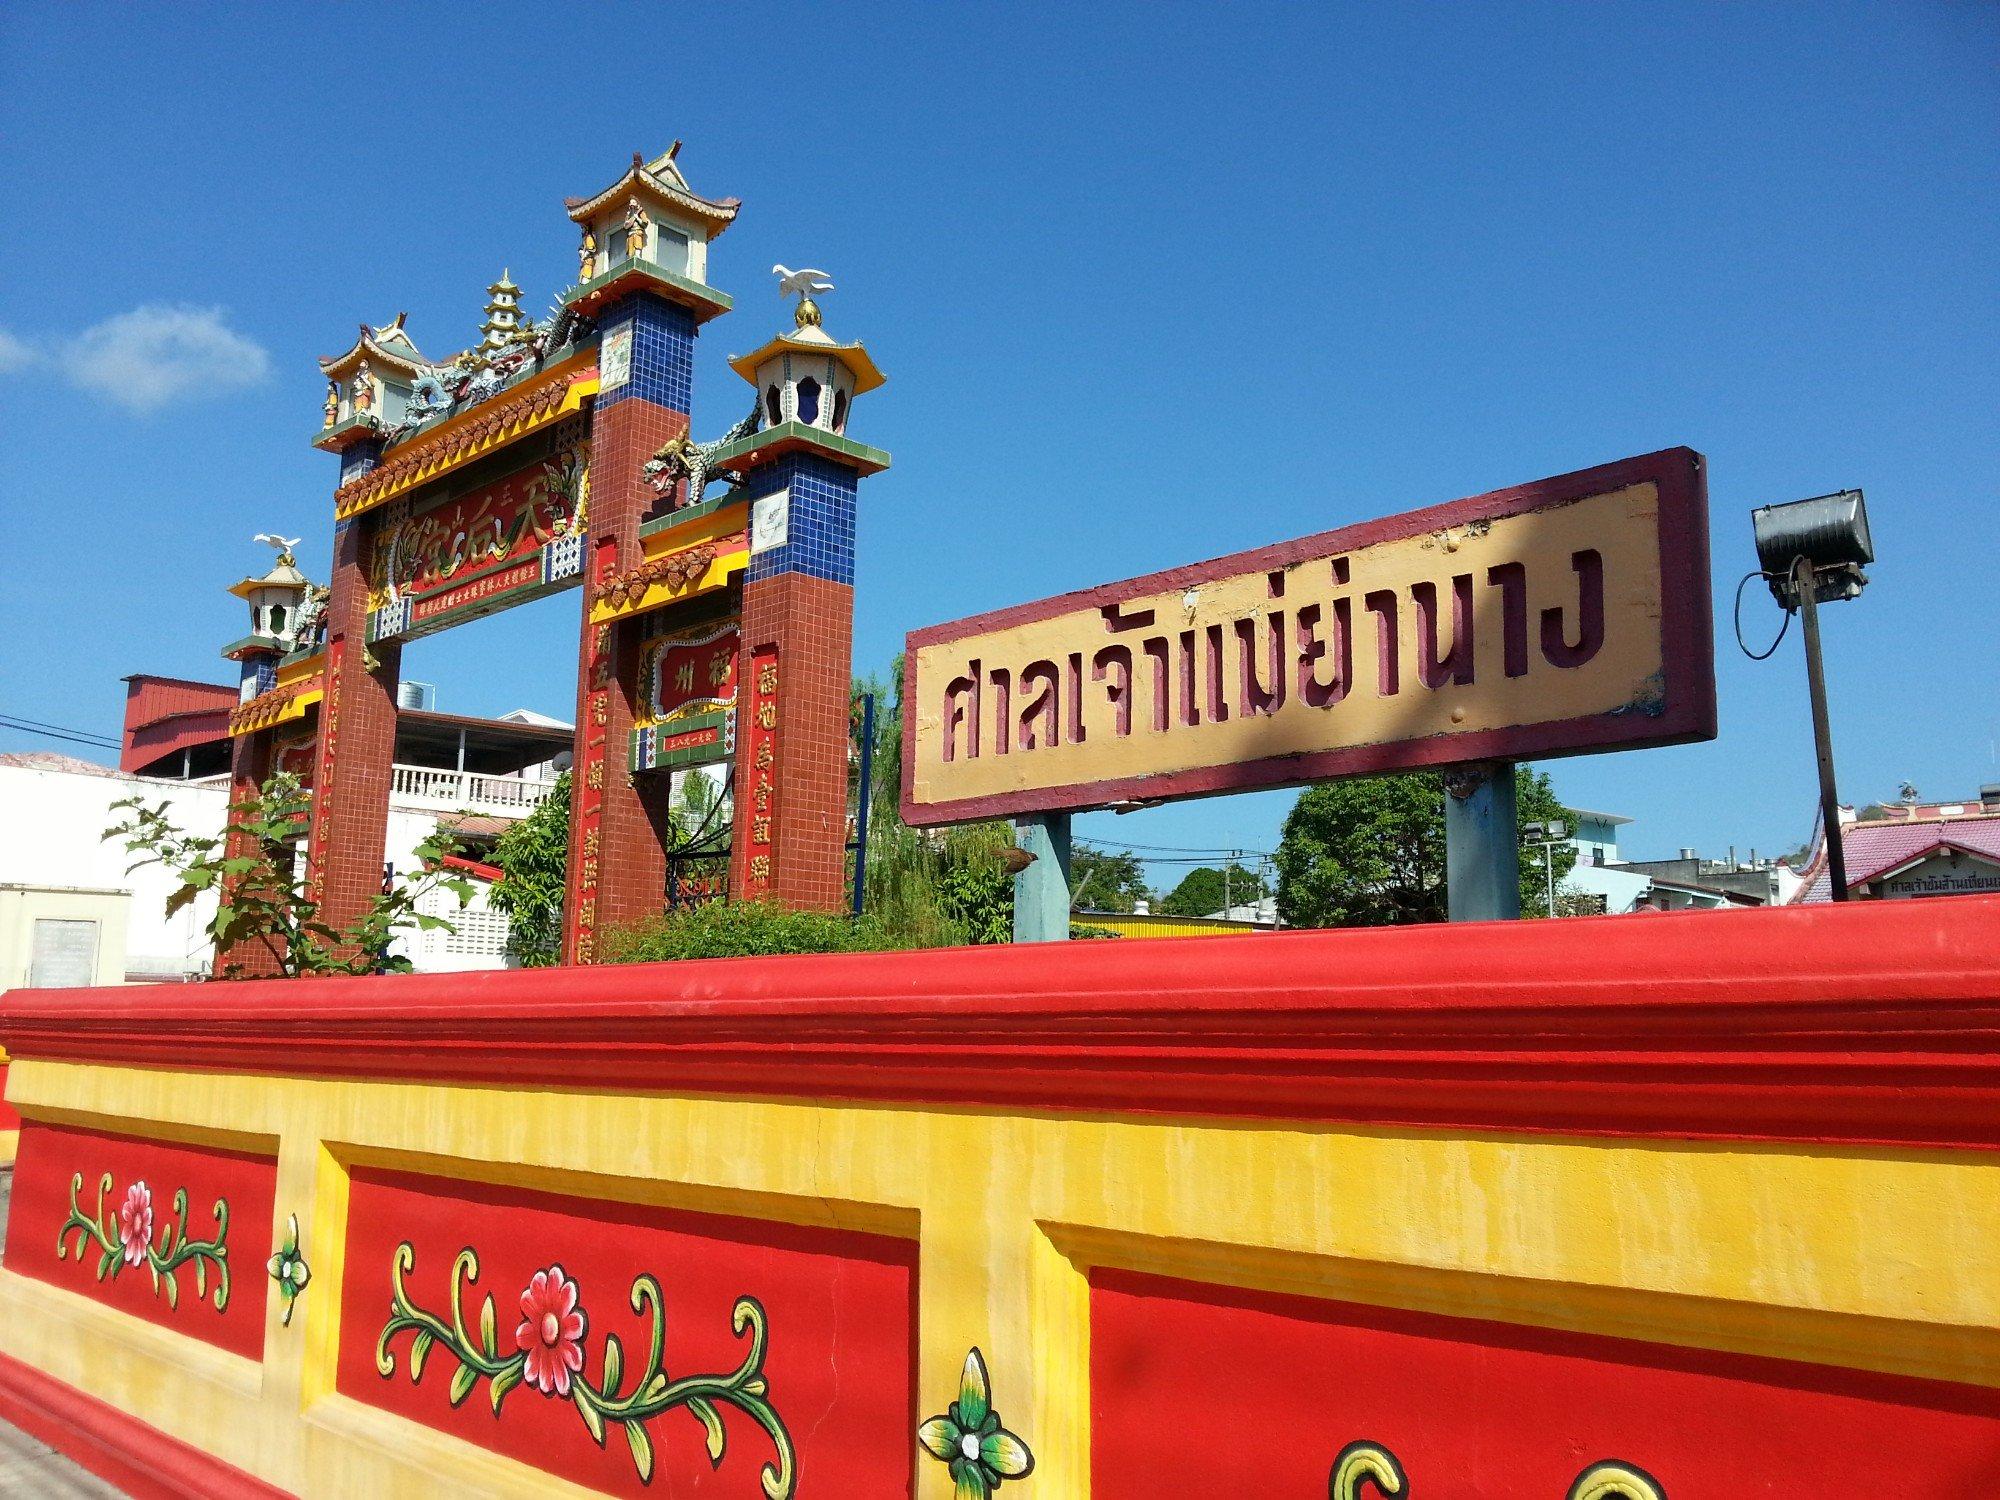 Entrance to the Chaomae Ya Nang Shrine